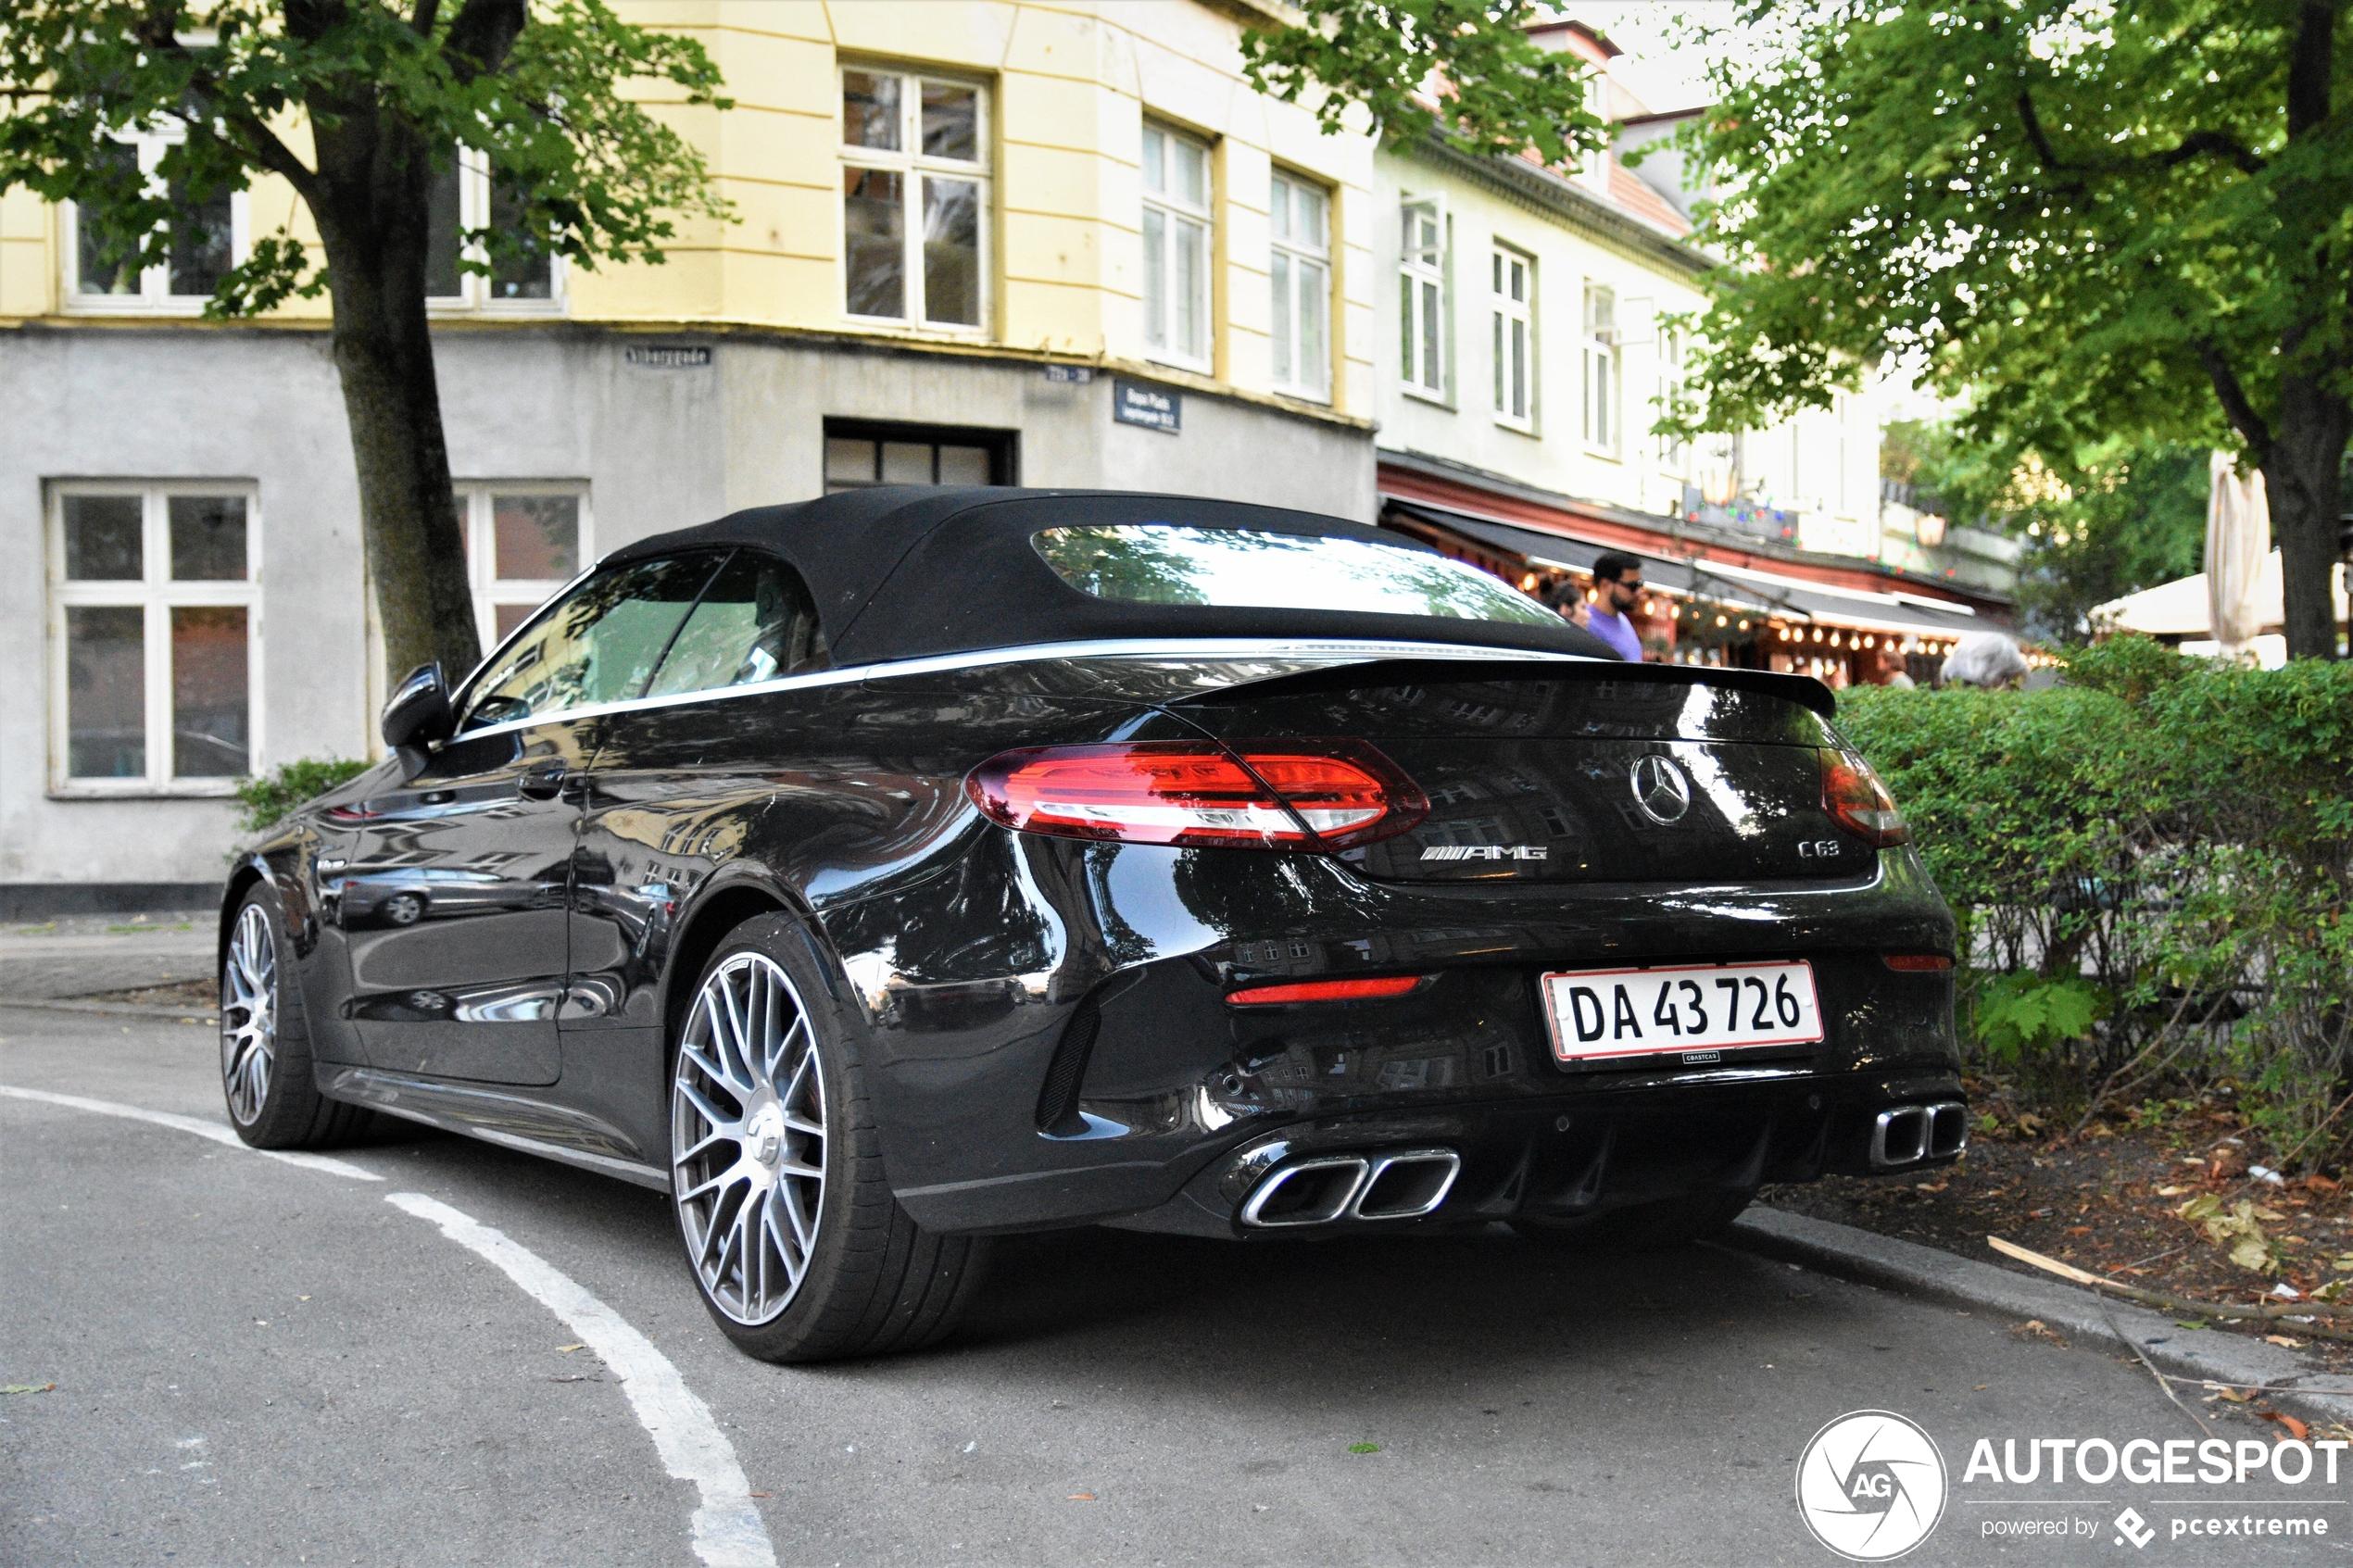 Mercedes-AMG C 63 Convertible A205 2018